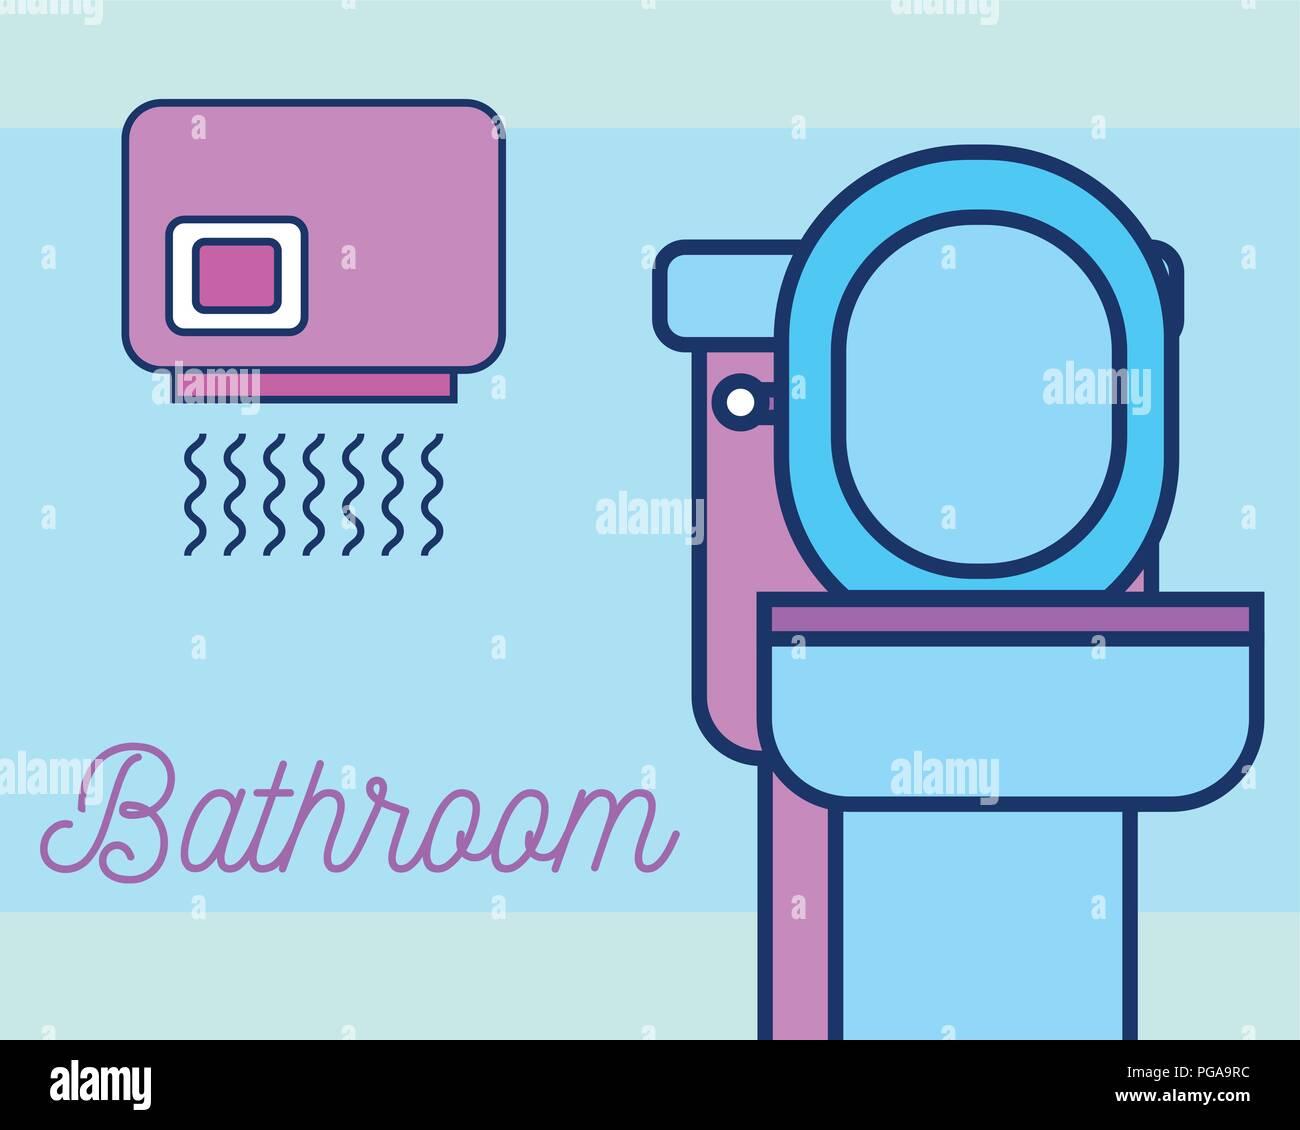 Hand Dryer Bathroom Stock Photos  Hand Dryer Bathroom